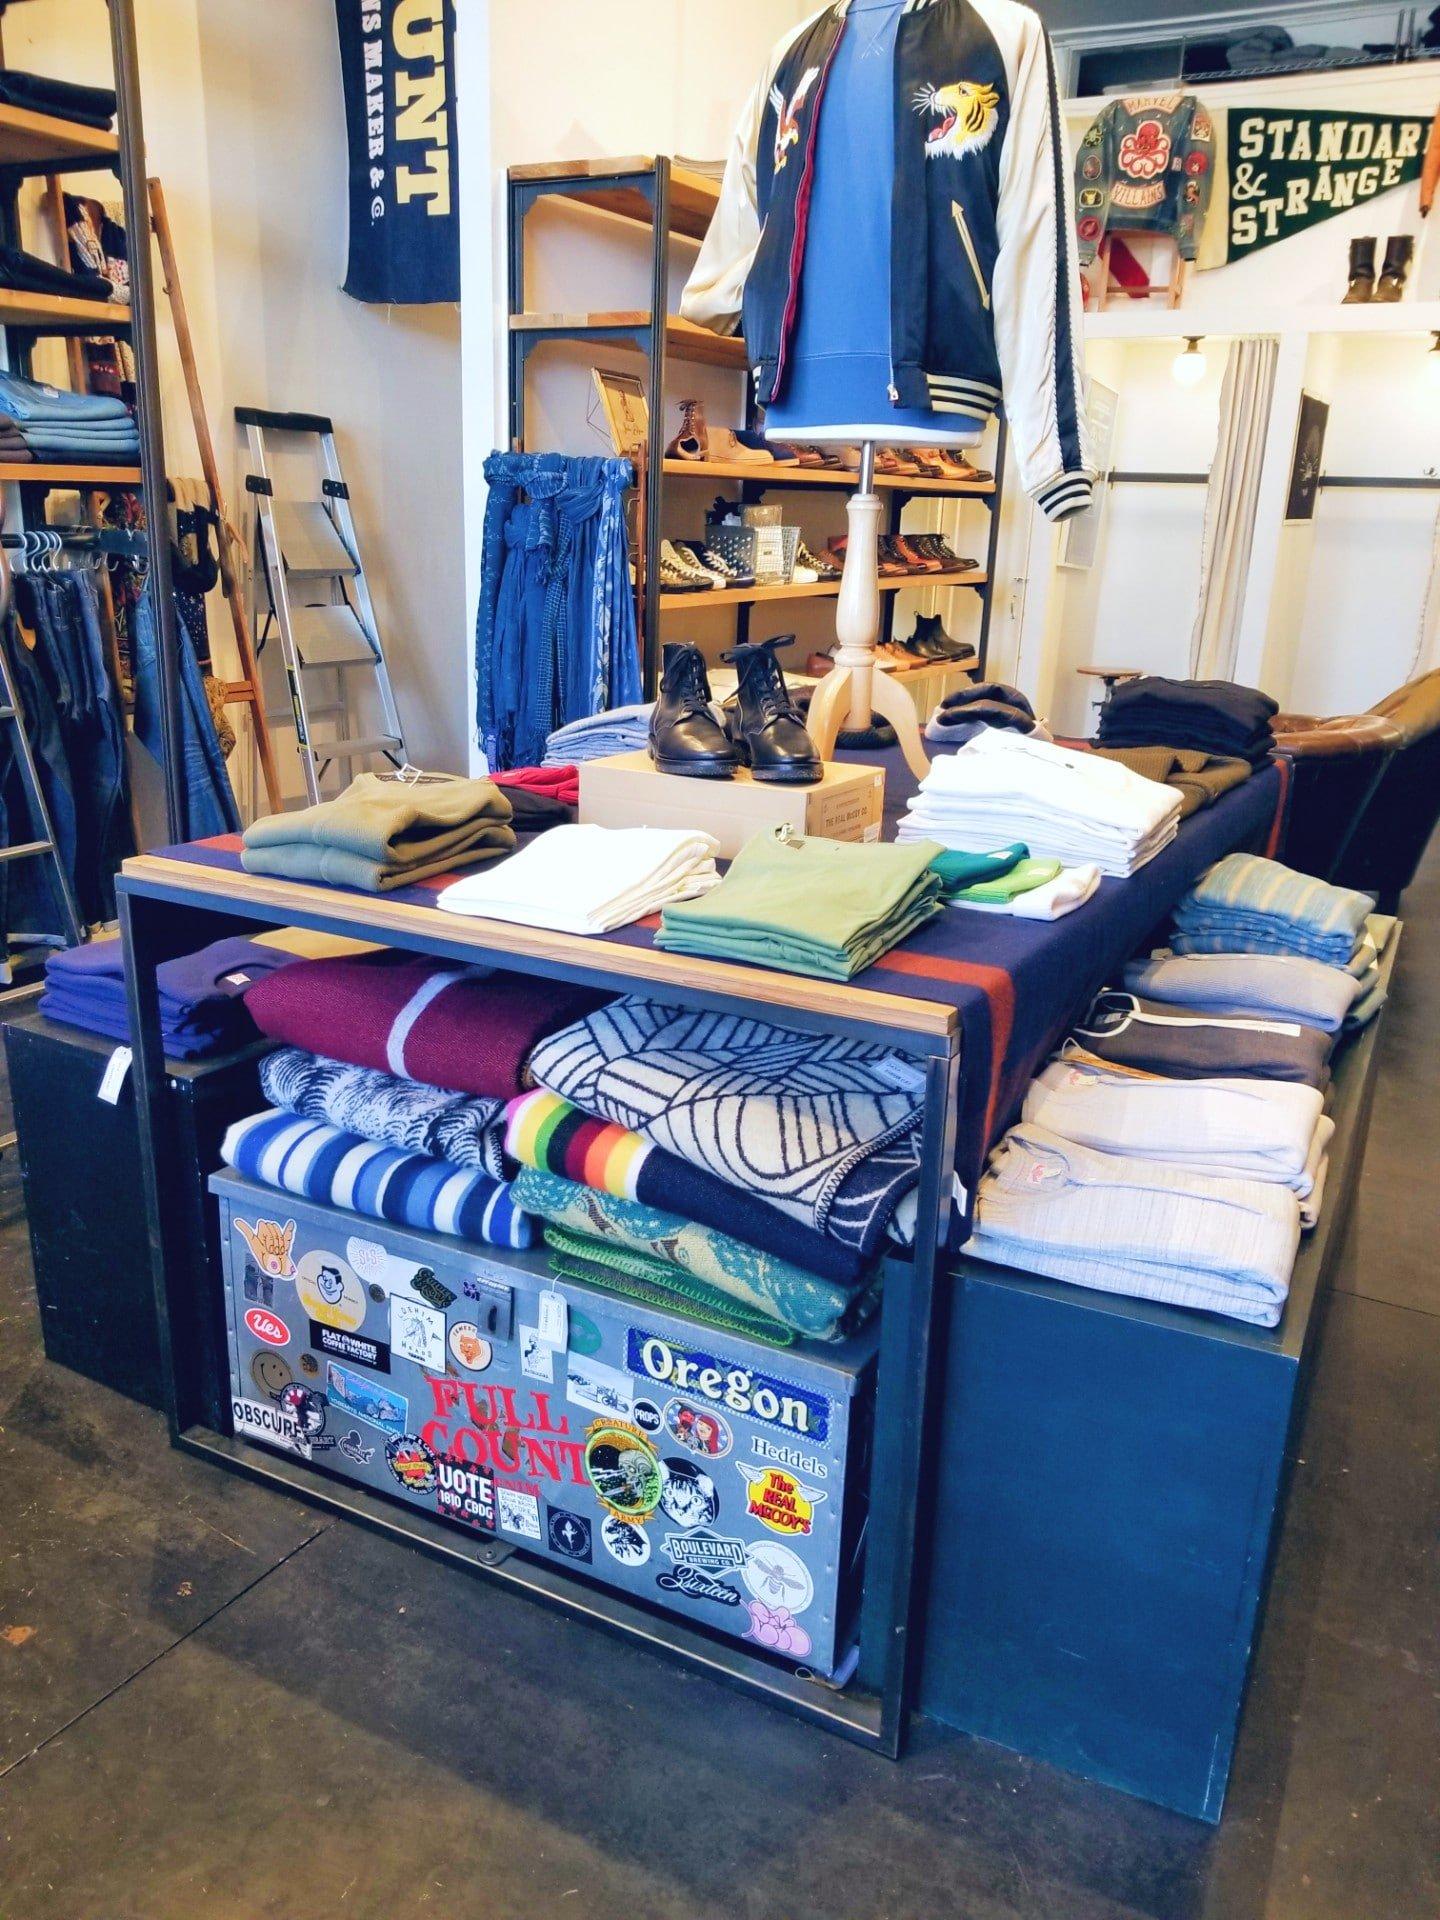 Standard & Strange Inside Temescal Shop